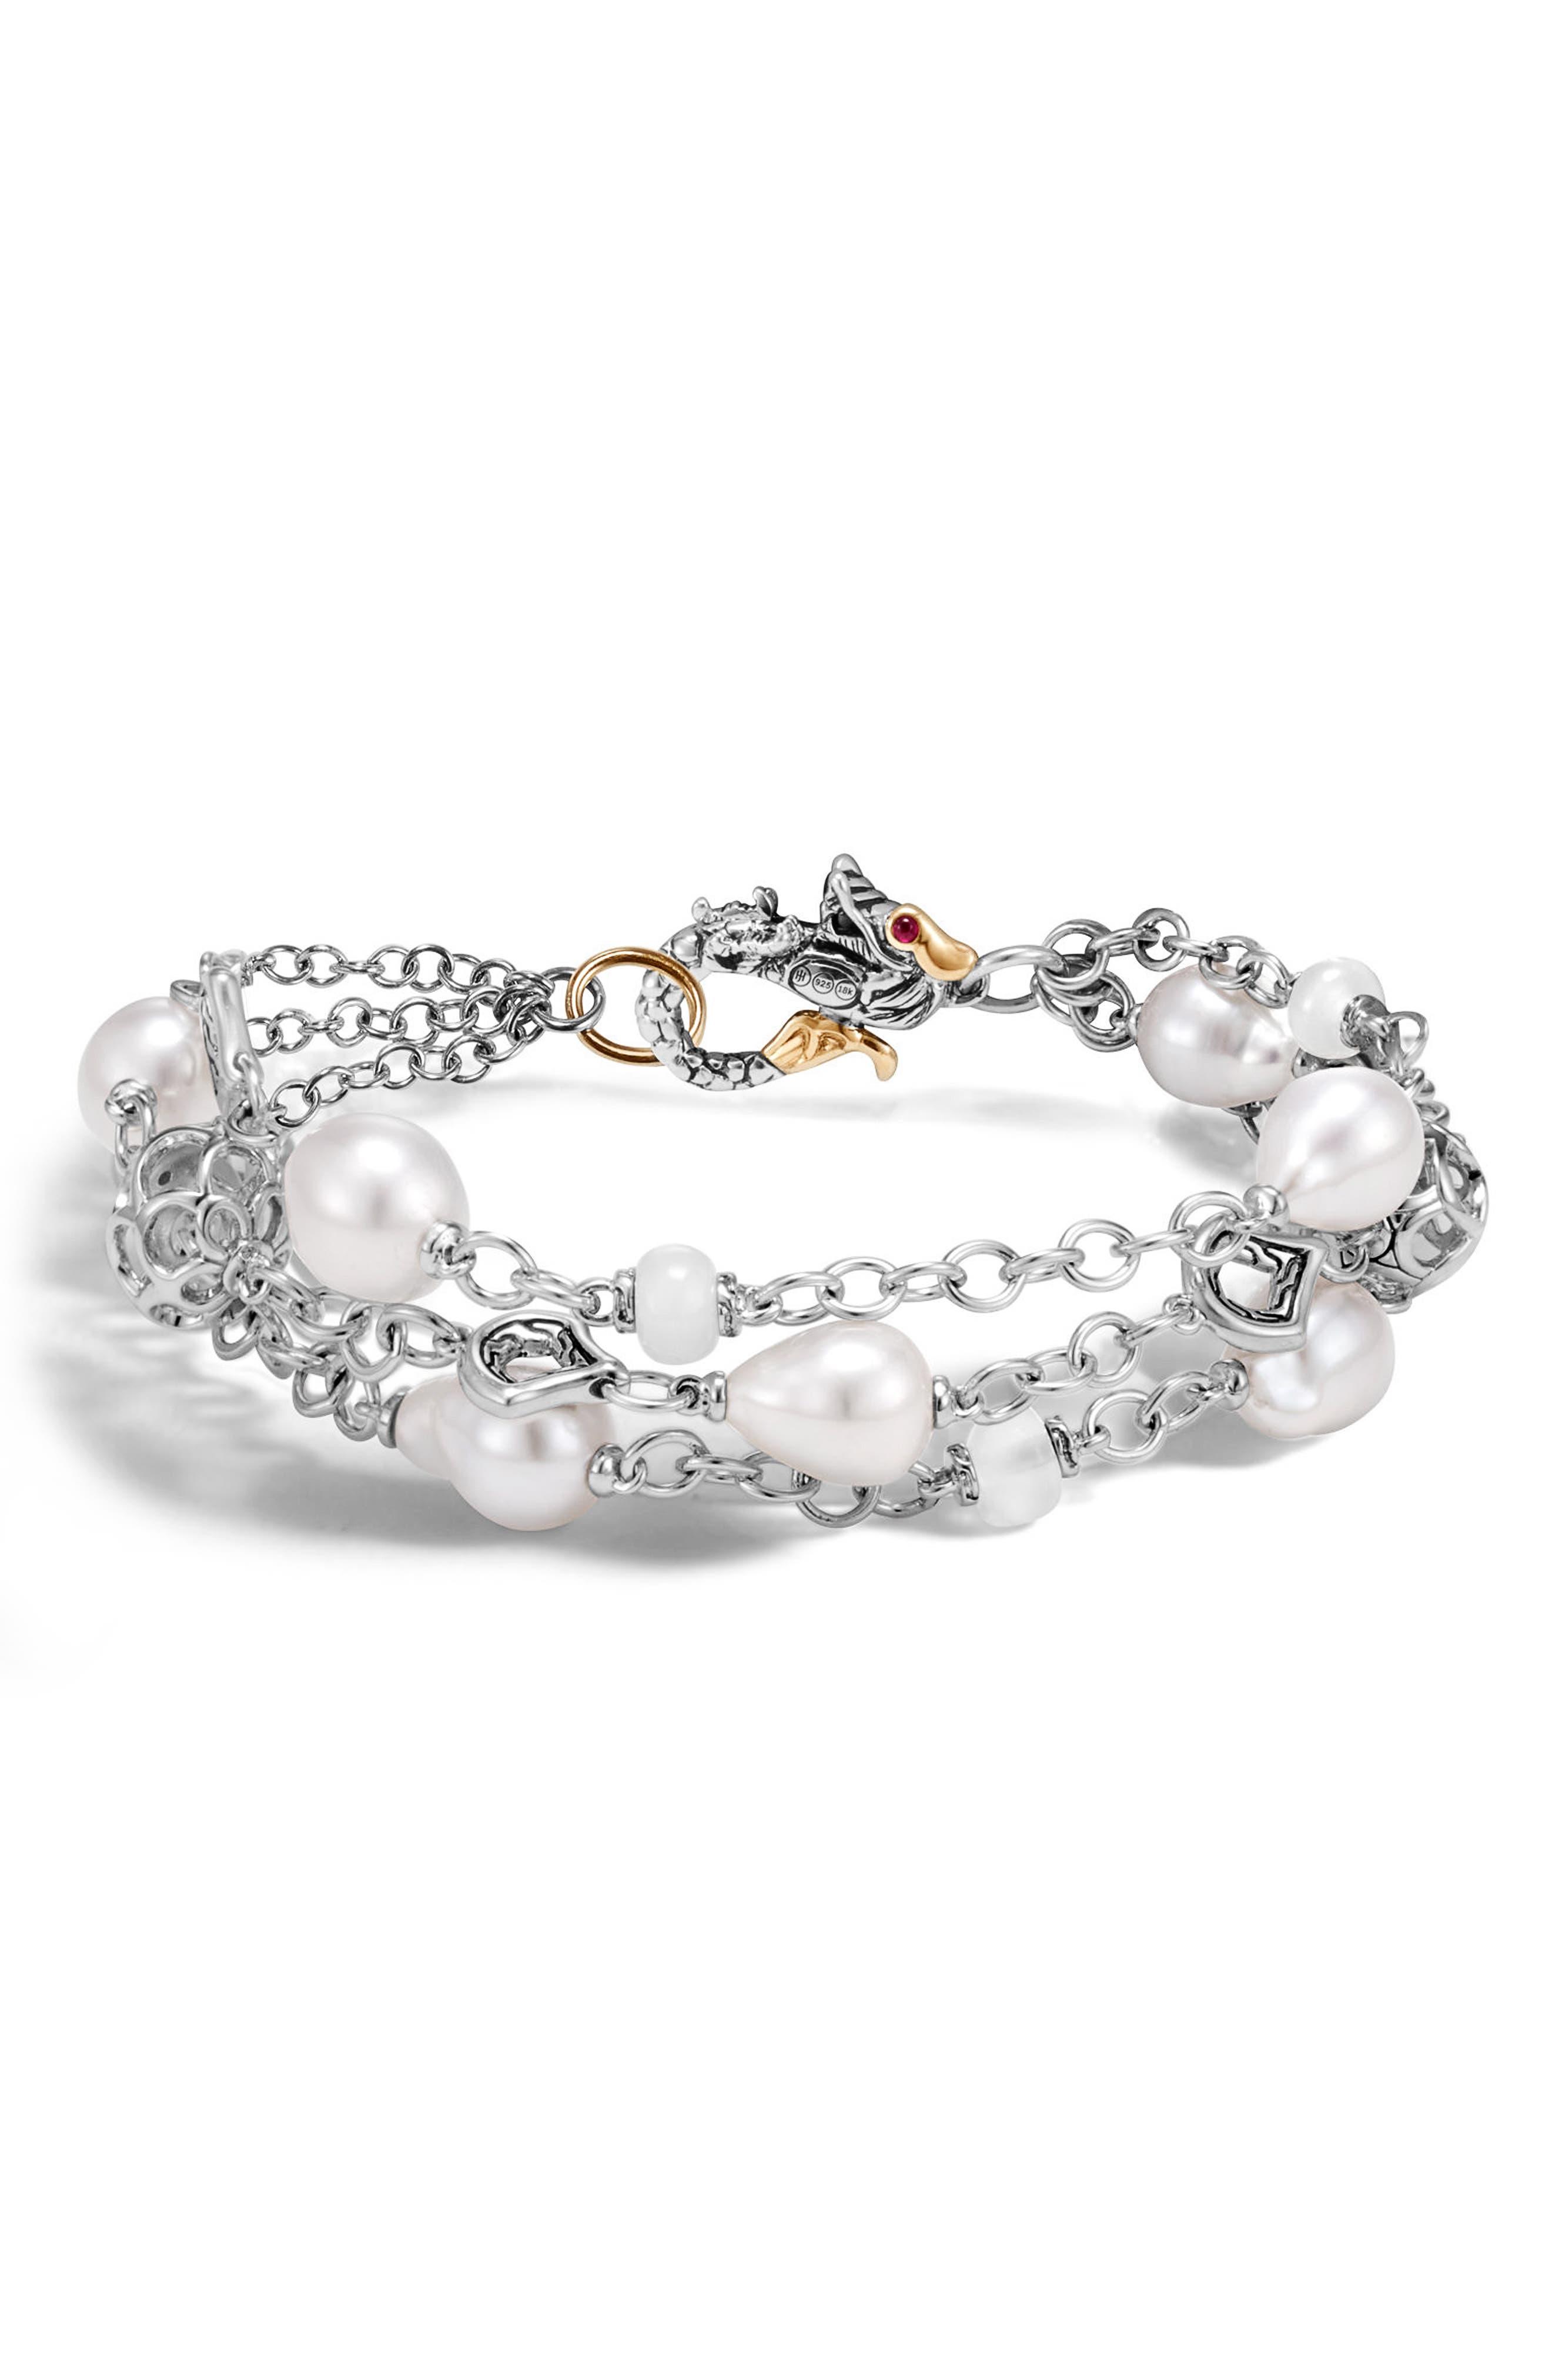 Legends Pearl Bracelet,                         Main,                         color, Silver/ Gold/ Pearl